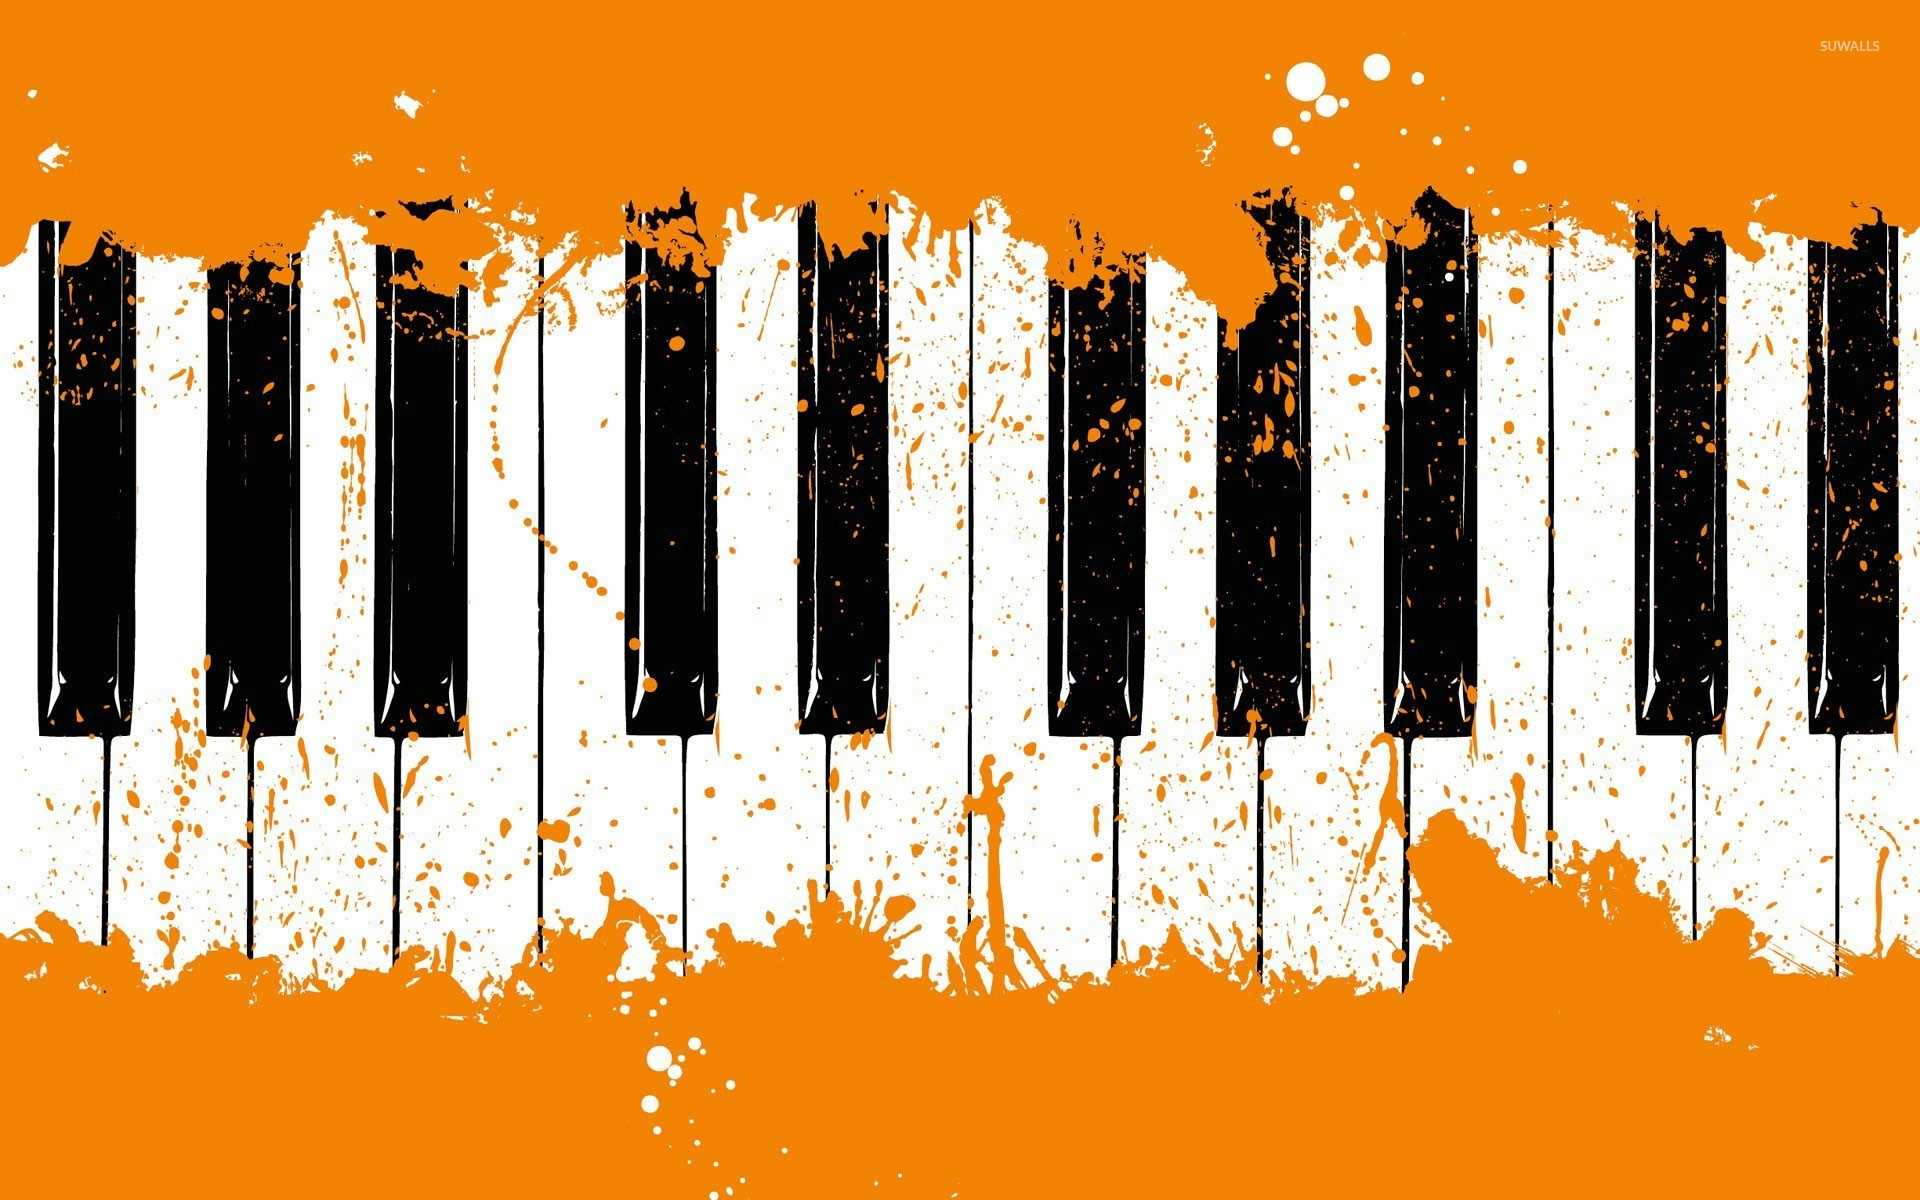 piano keyboard wallpaper digital art wallpapers 21116